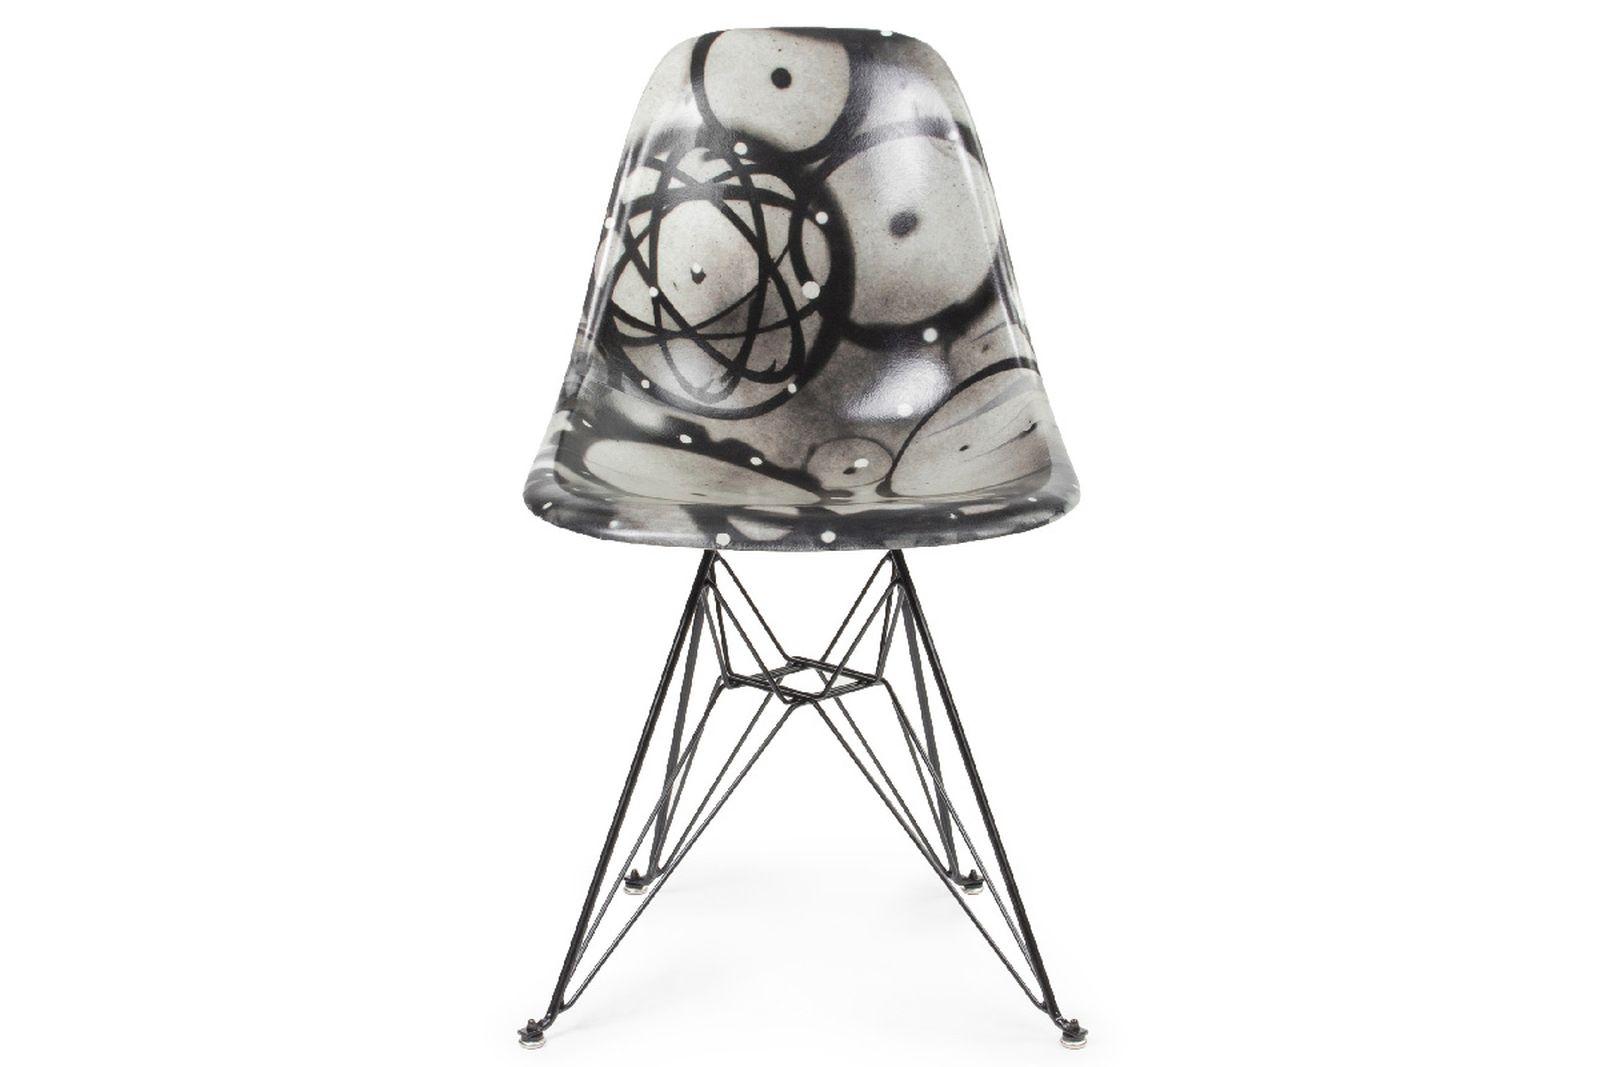 beyond the streets modernica artist series collab Shepard Fairey futura 2000 jean michel basquiat